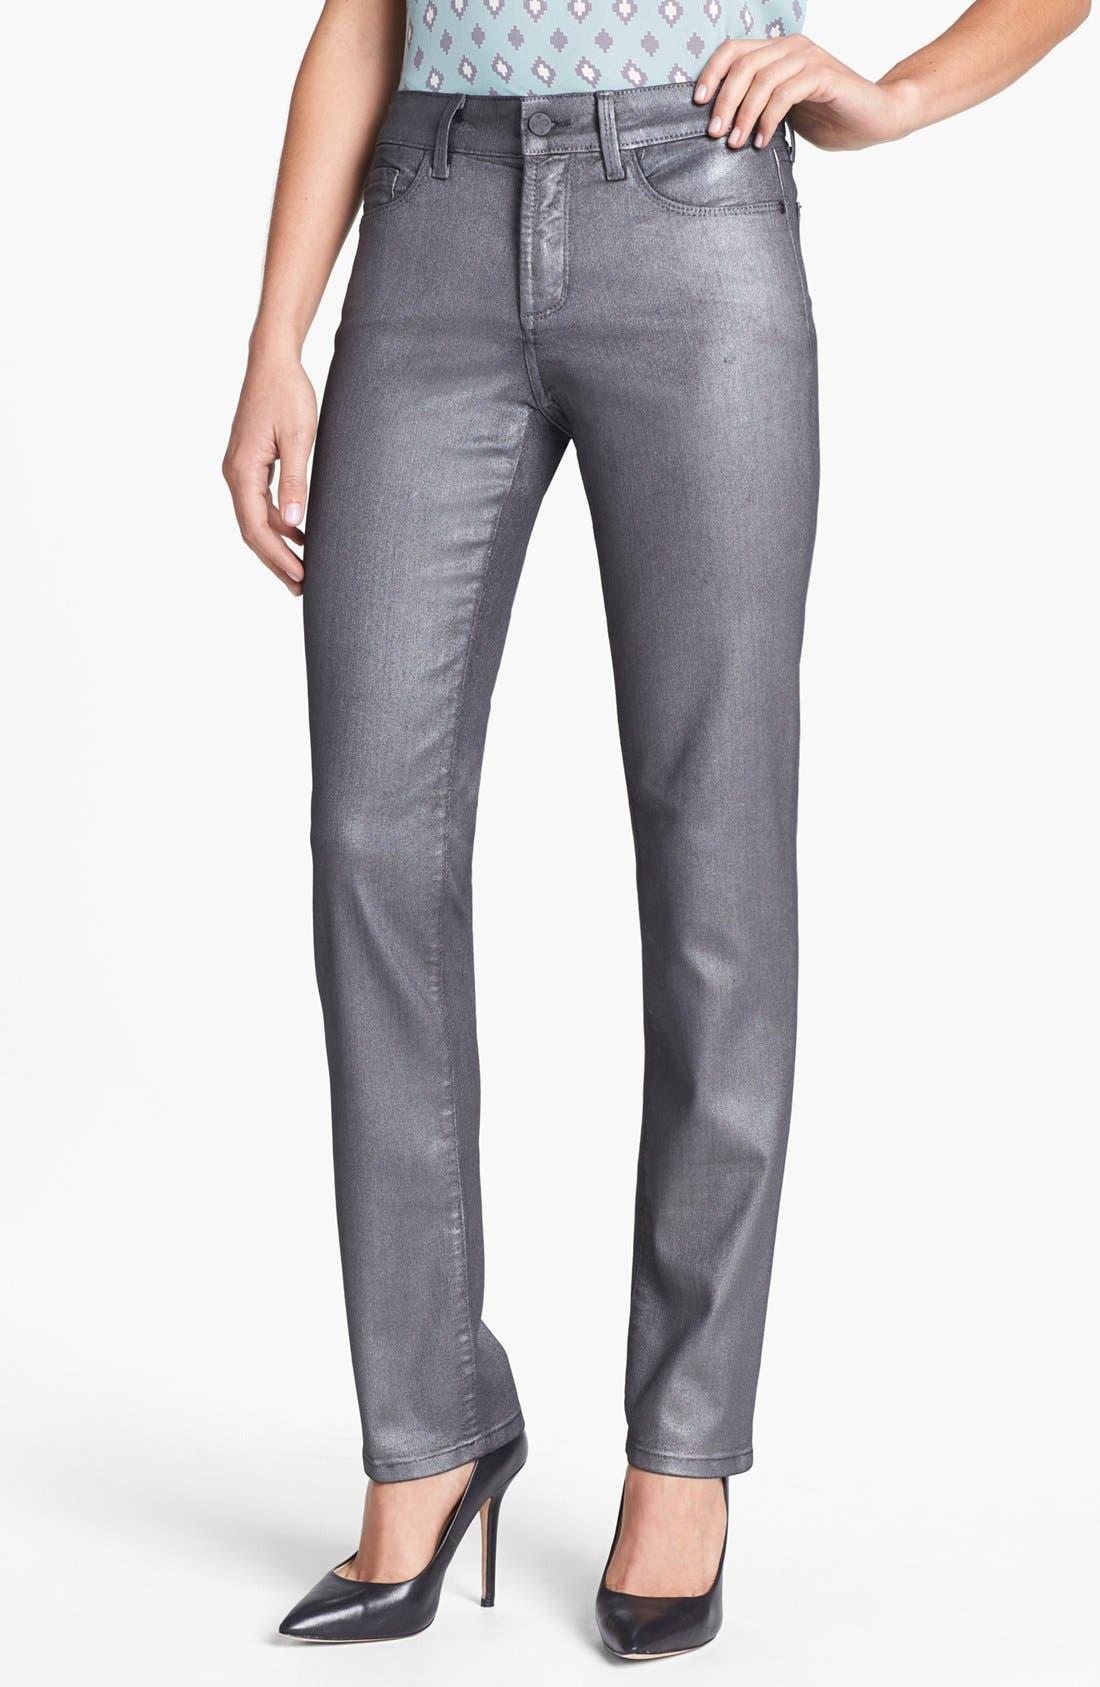 Main Image - NYDJ 'Sheri' Foiled Stretch Skinny Jeans